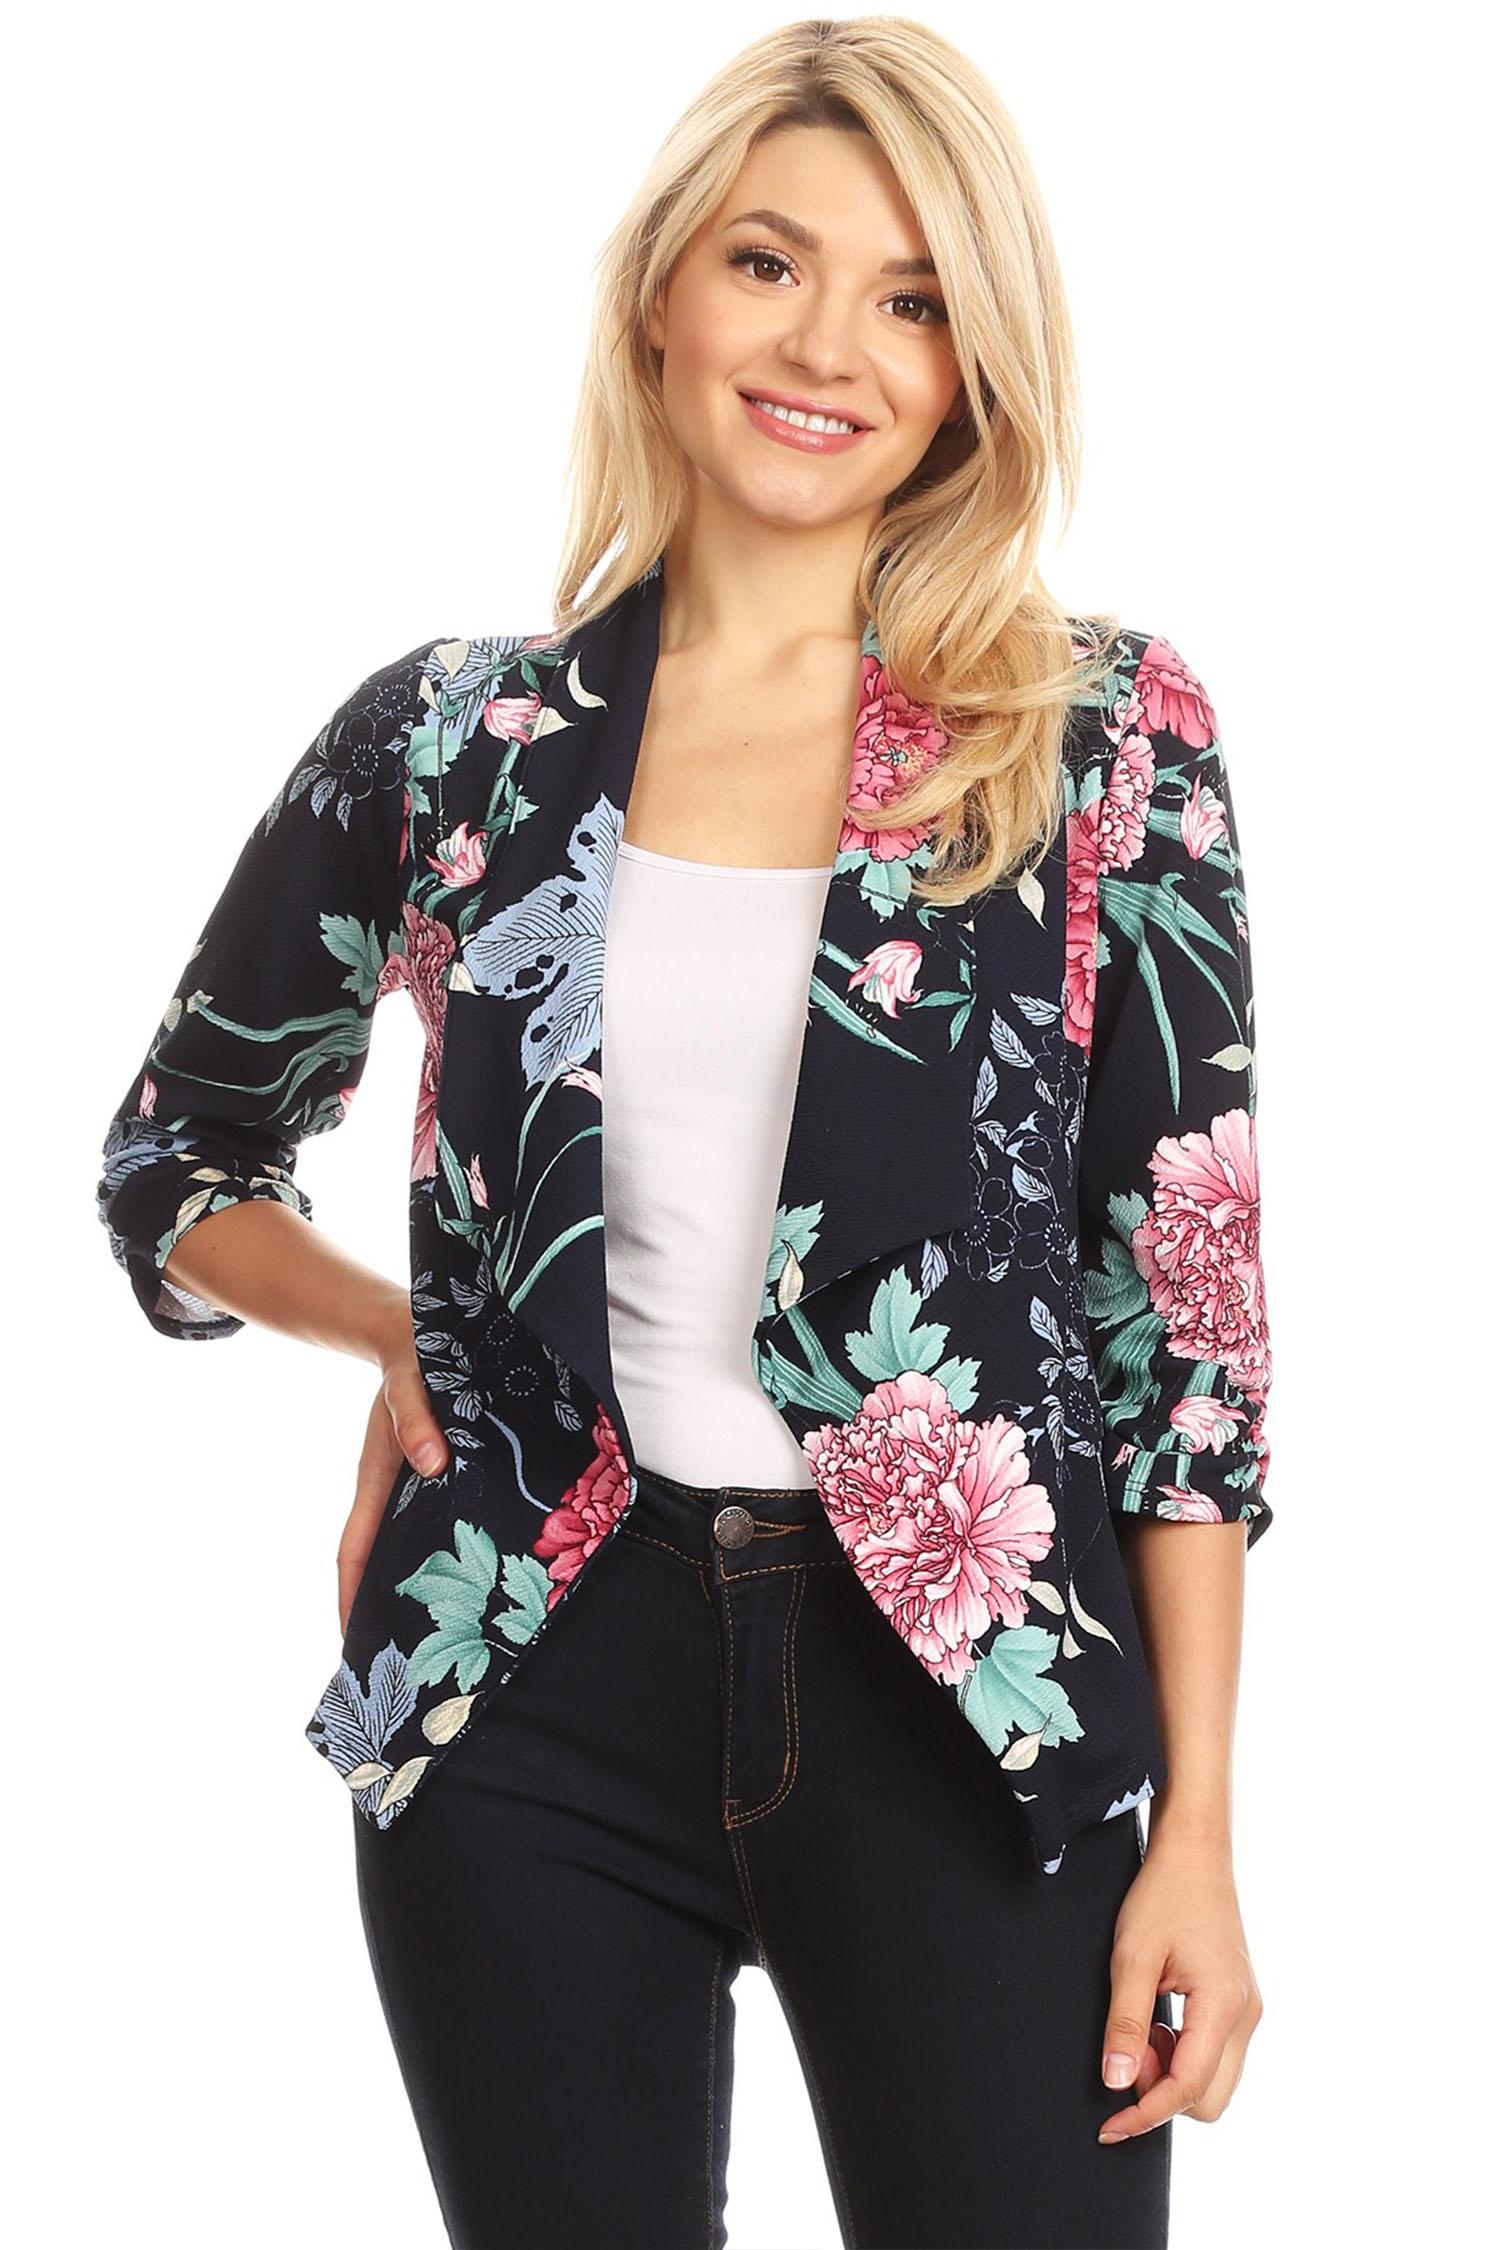 Women's Trendy Style 3/4 Sleeves Print Open Jacket